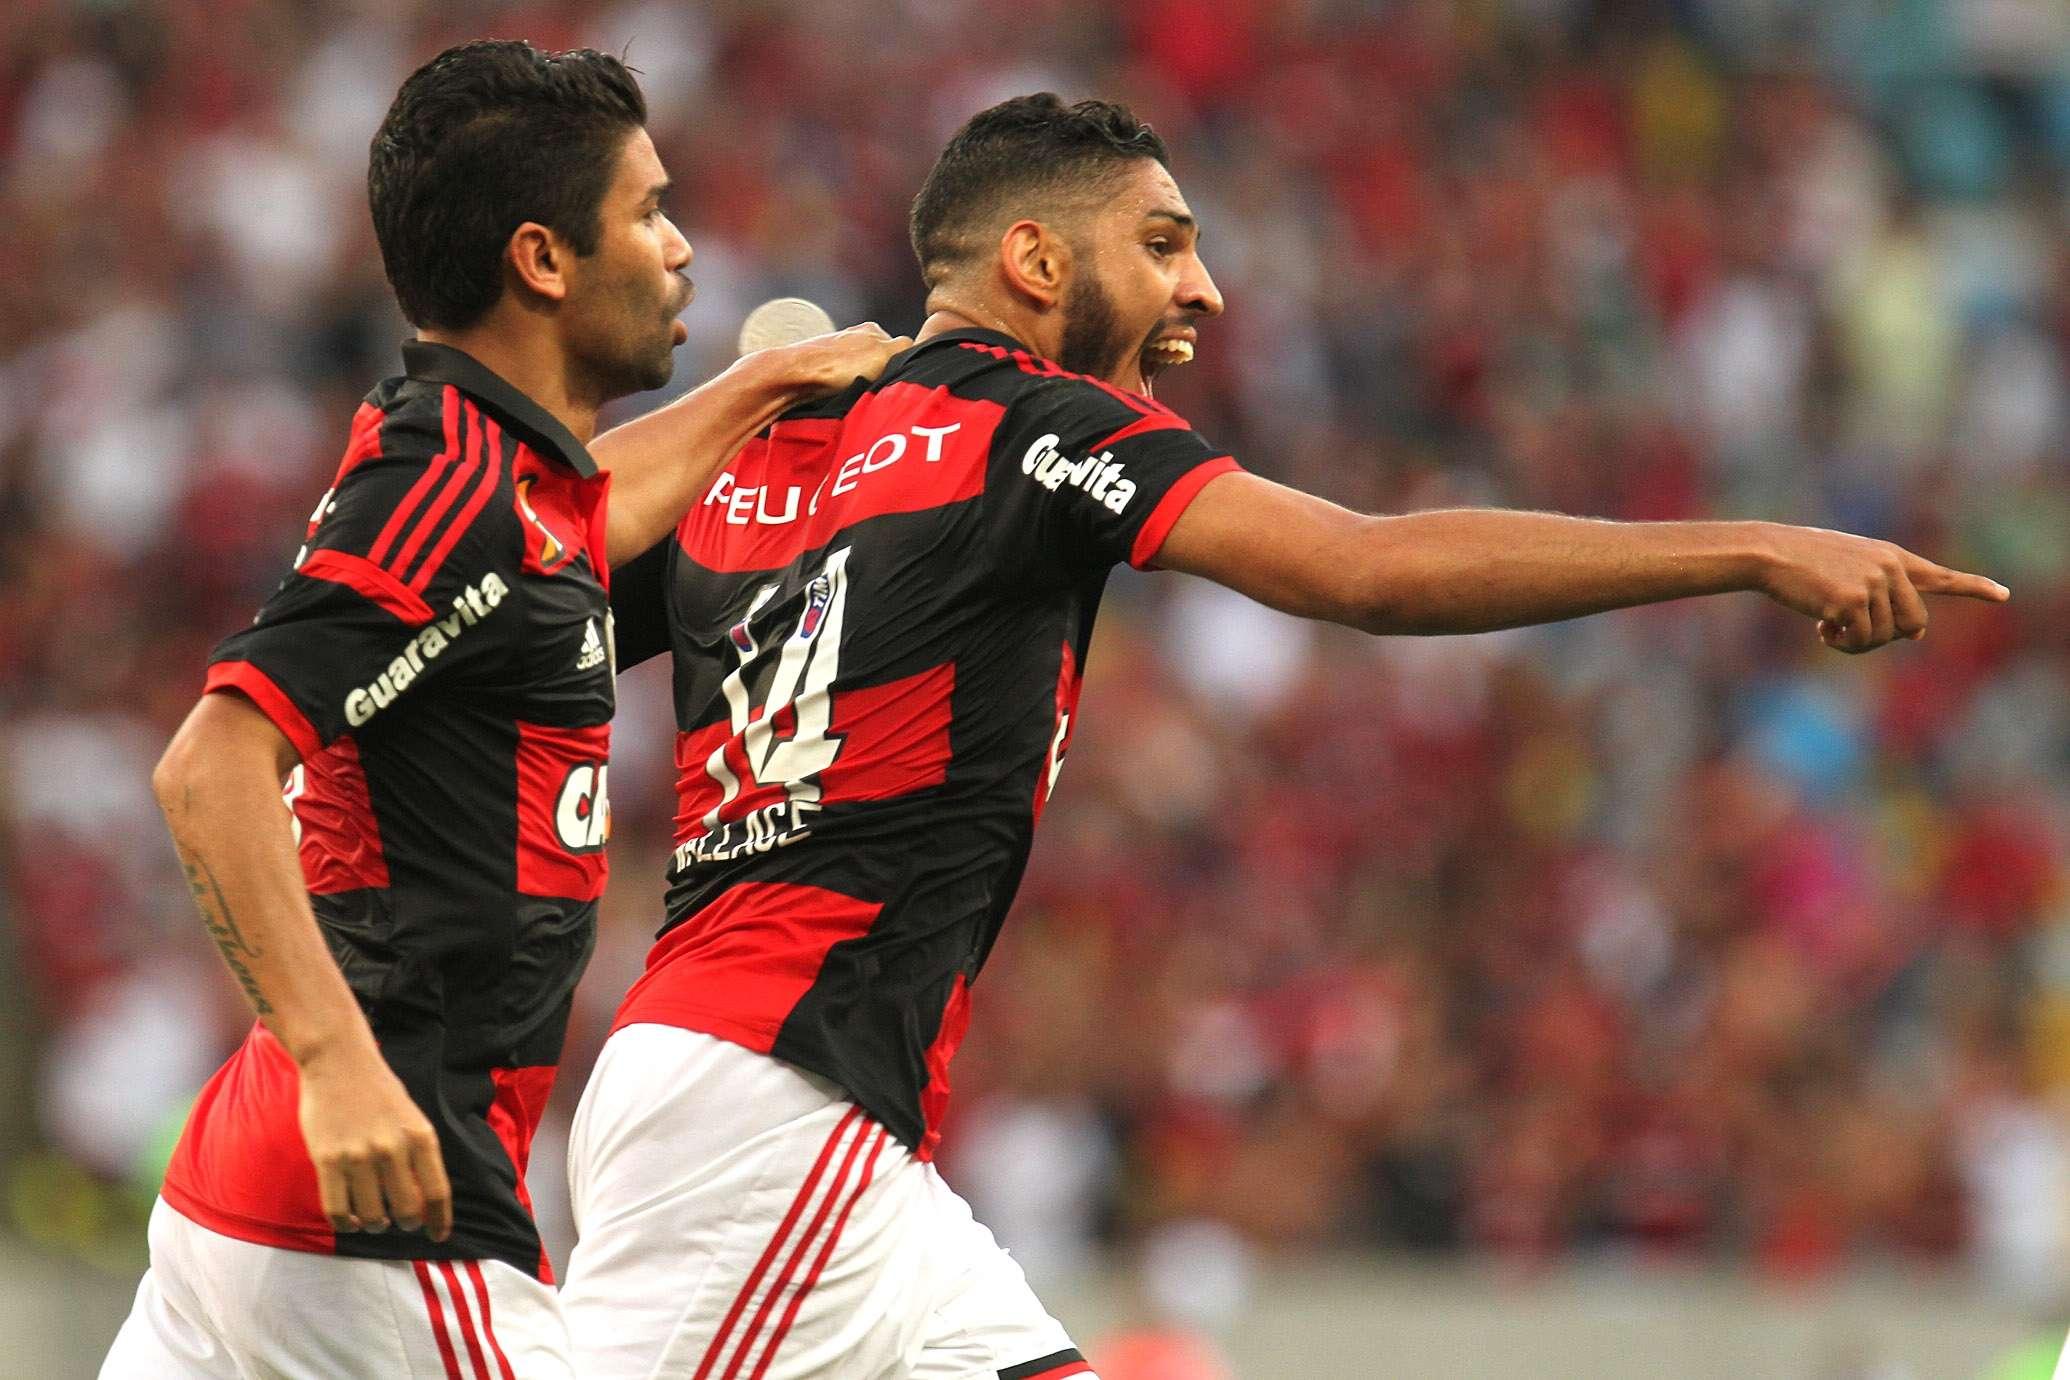 Wallace festeja gol do Flamengo Foto: Gilvan de Souza/Fla Imagens/Divulgação